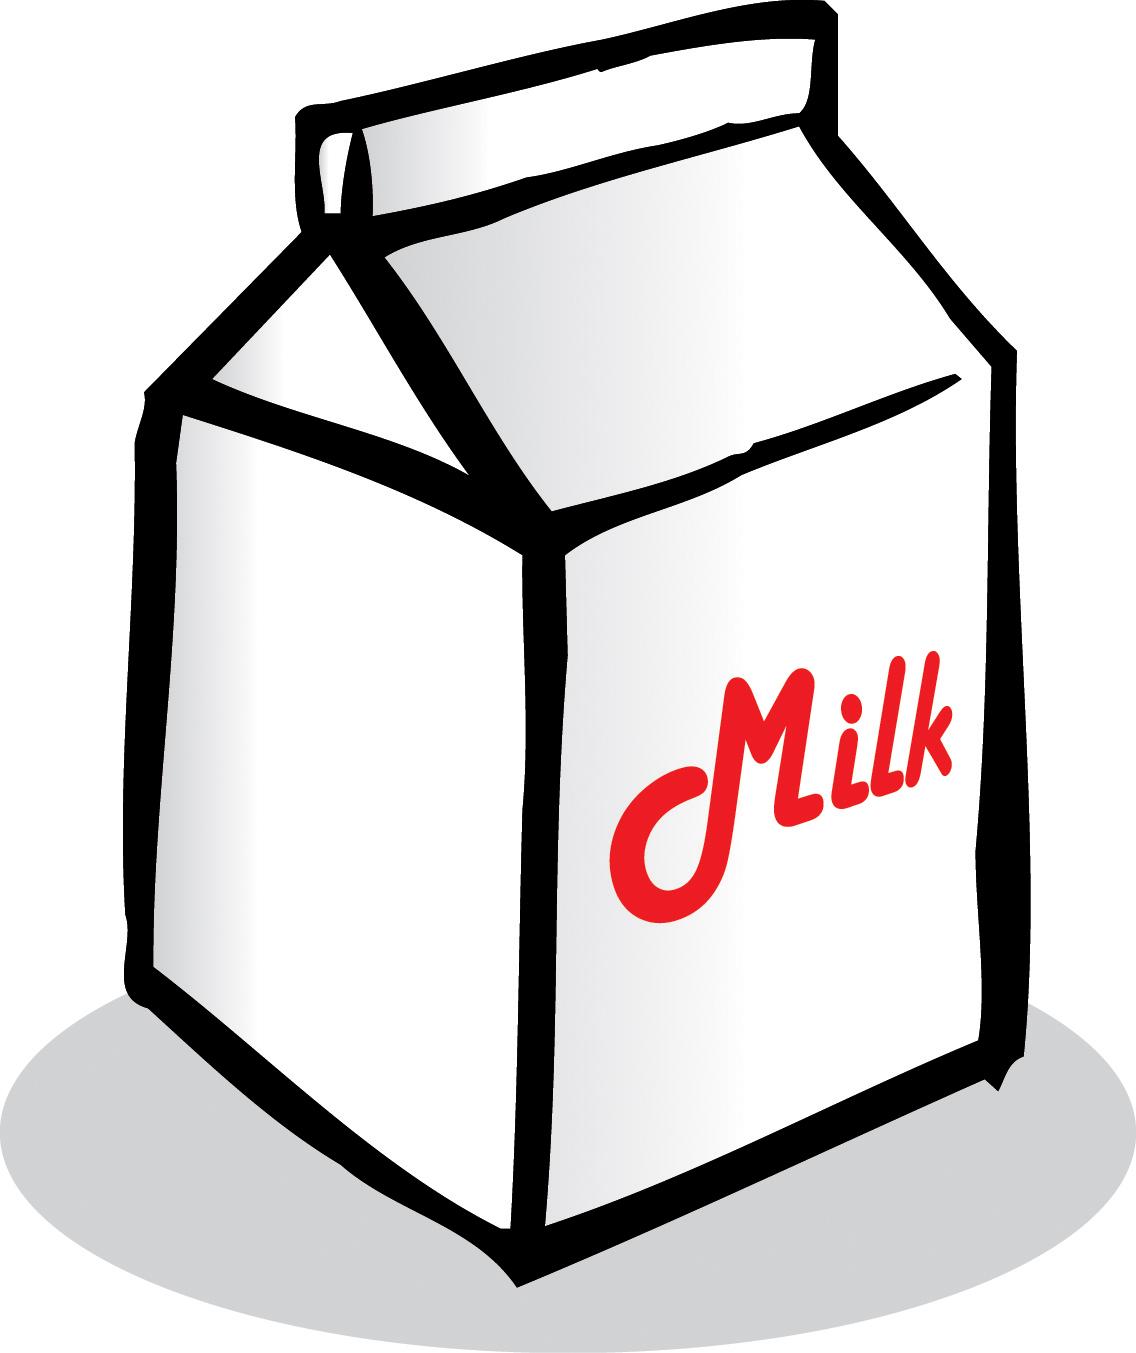 Milk cartoon clipart svg stock Milk carton clipart · Clip art | Clipart Panda - Free Clipart Images svg stock